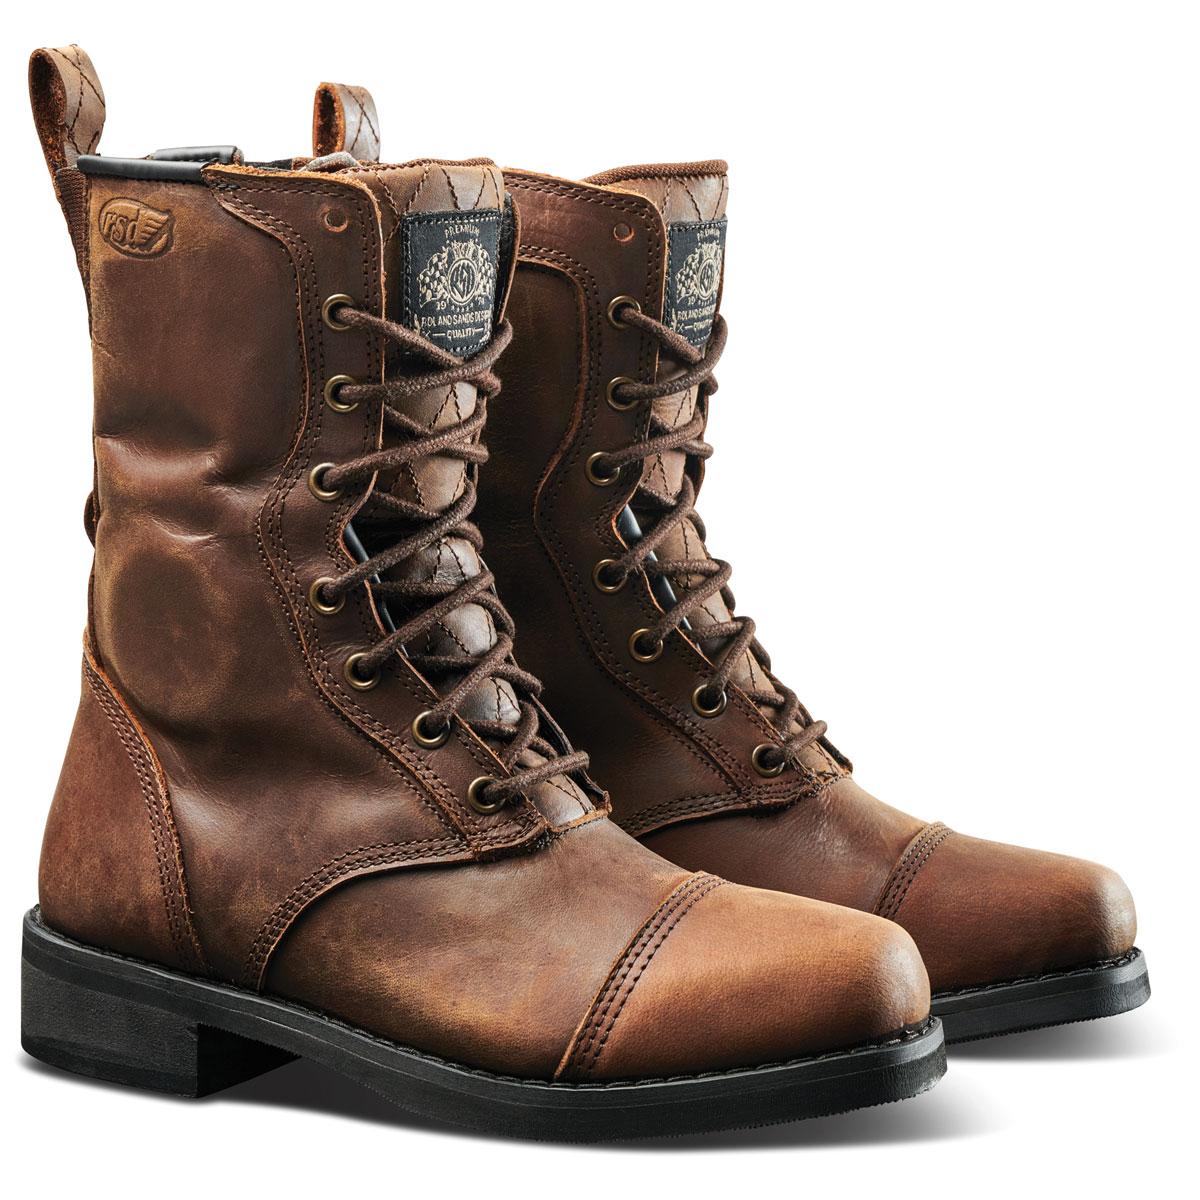 Roland Sands Design Apparel Women's Cajon Brown Leather Boots